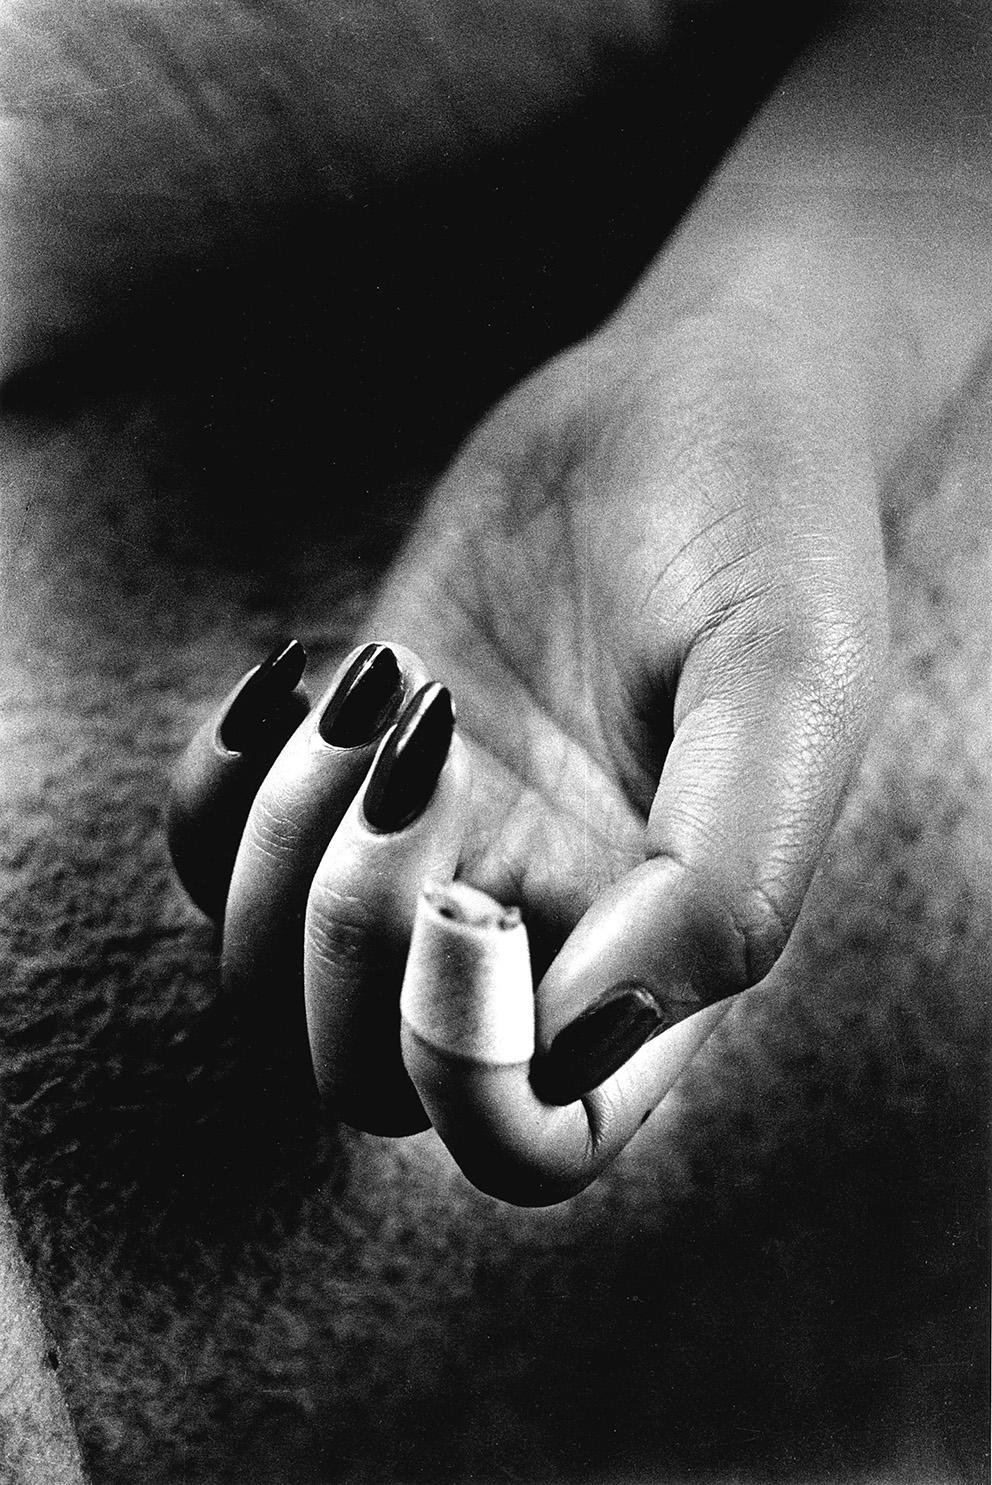 Daido Moriyama(né en 1938), Nails Claw, de la série «Lettre à St-Loup», 1990, tirage gélatino-argentique. ©Daido Moriyama Photo Foundati